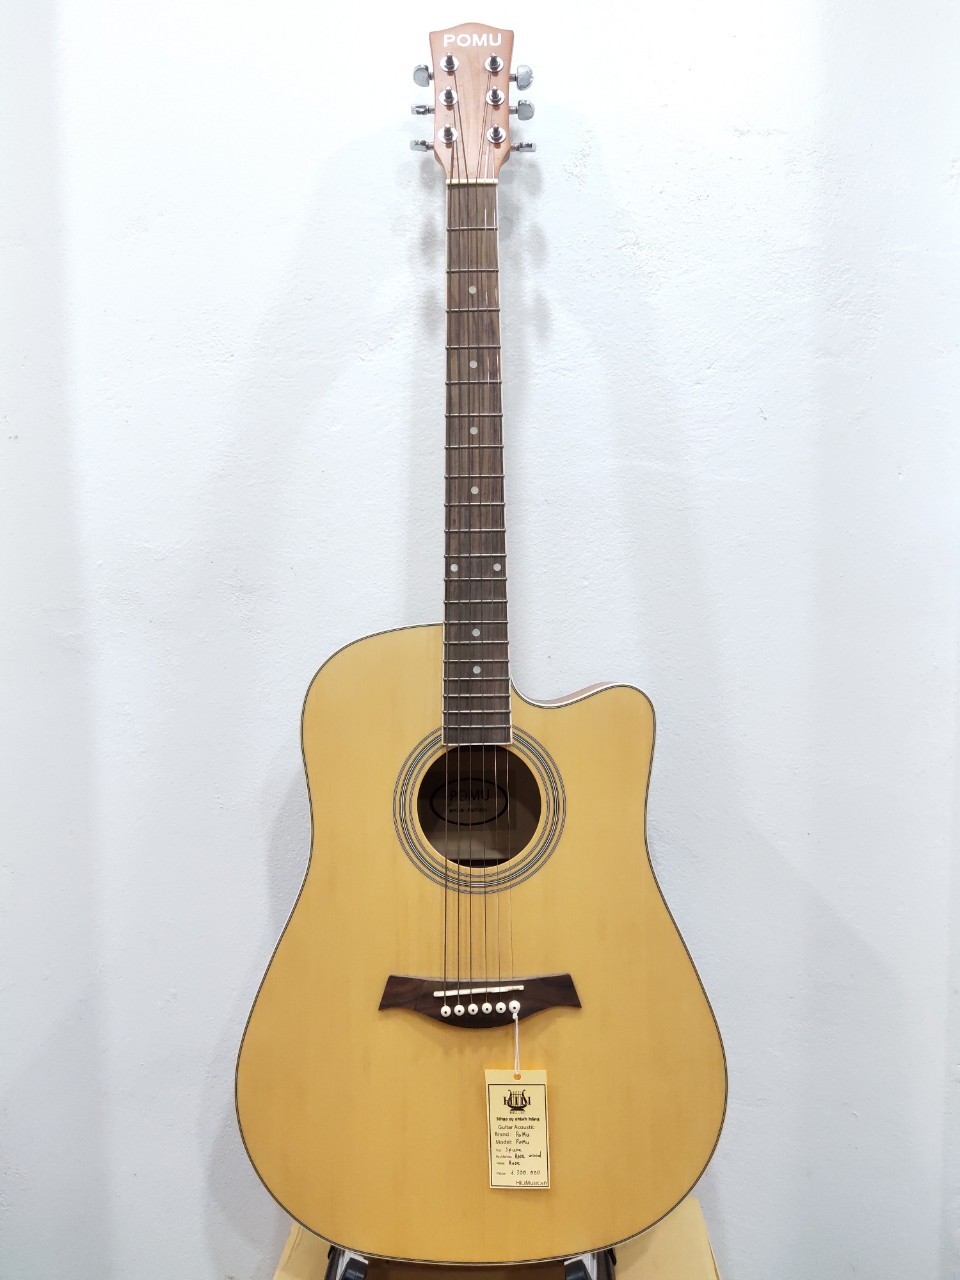 Đàn Guitar Acoustic POMU